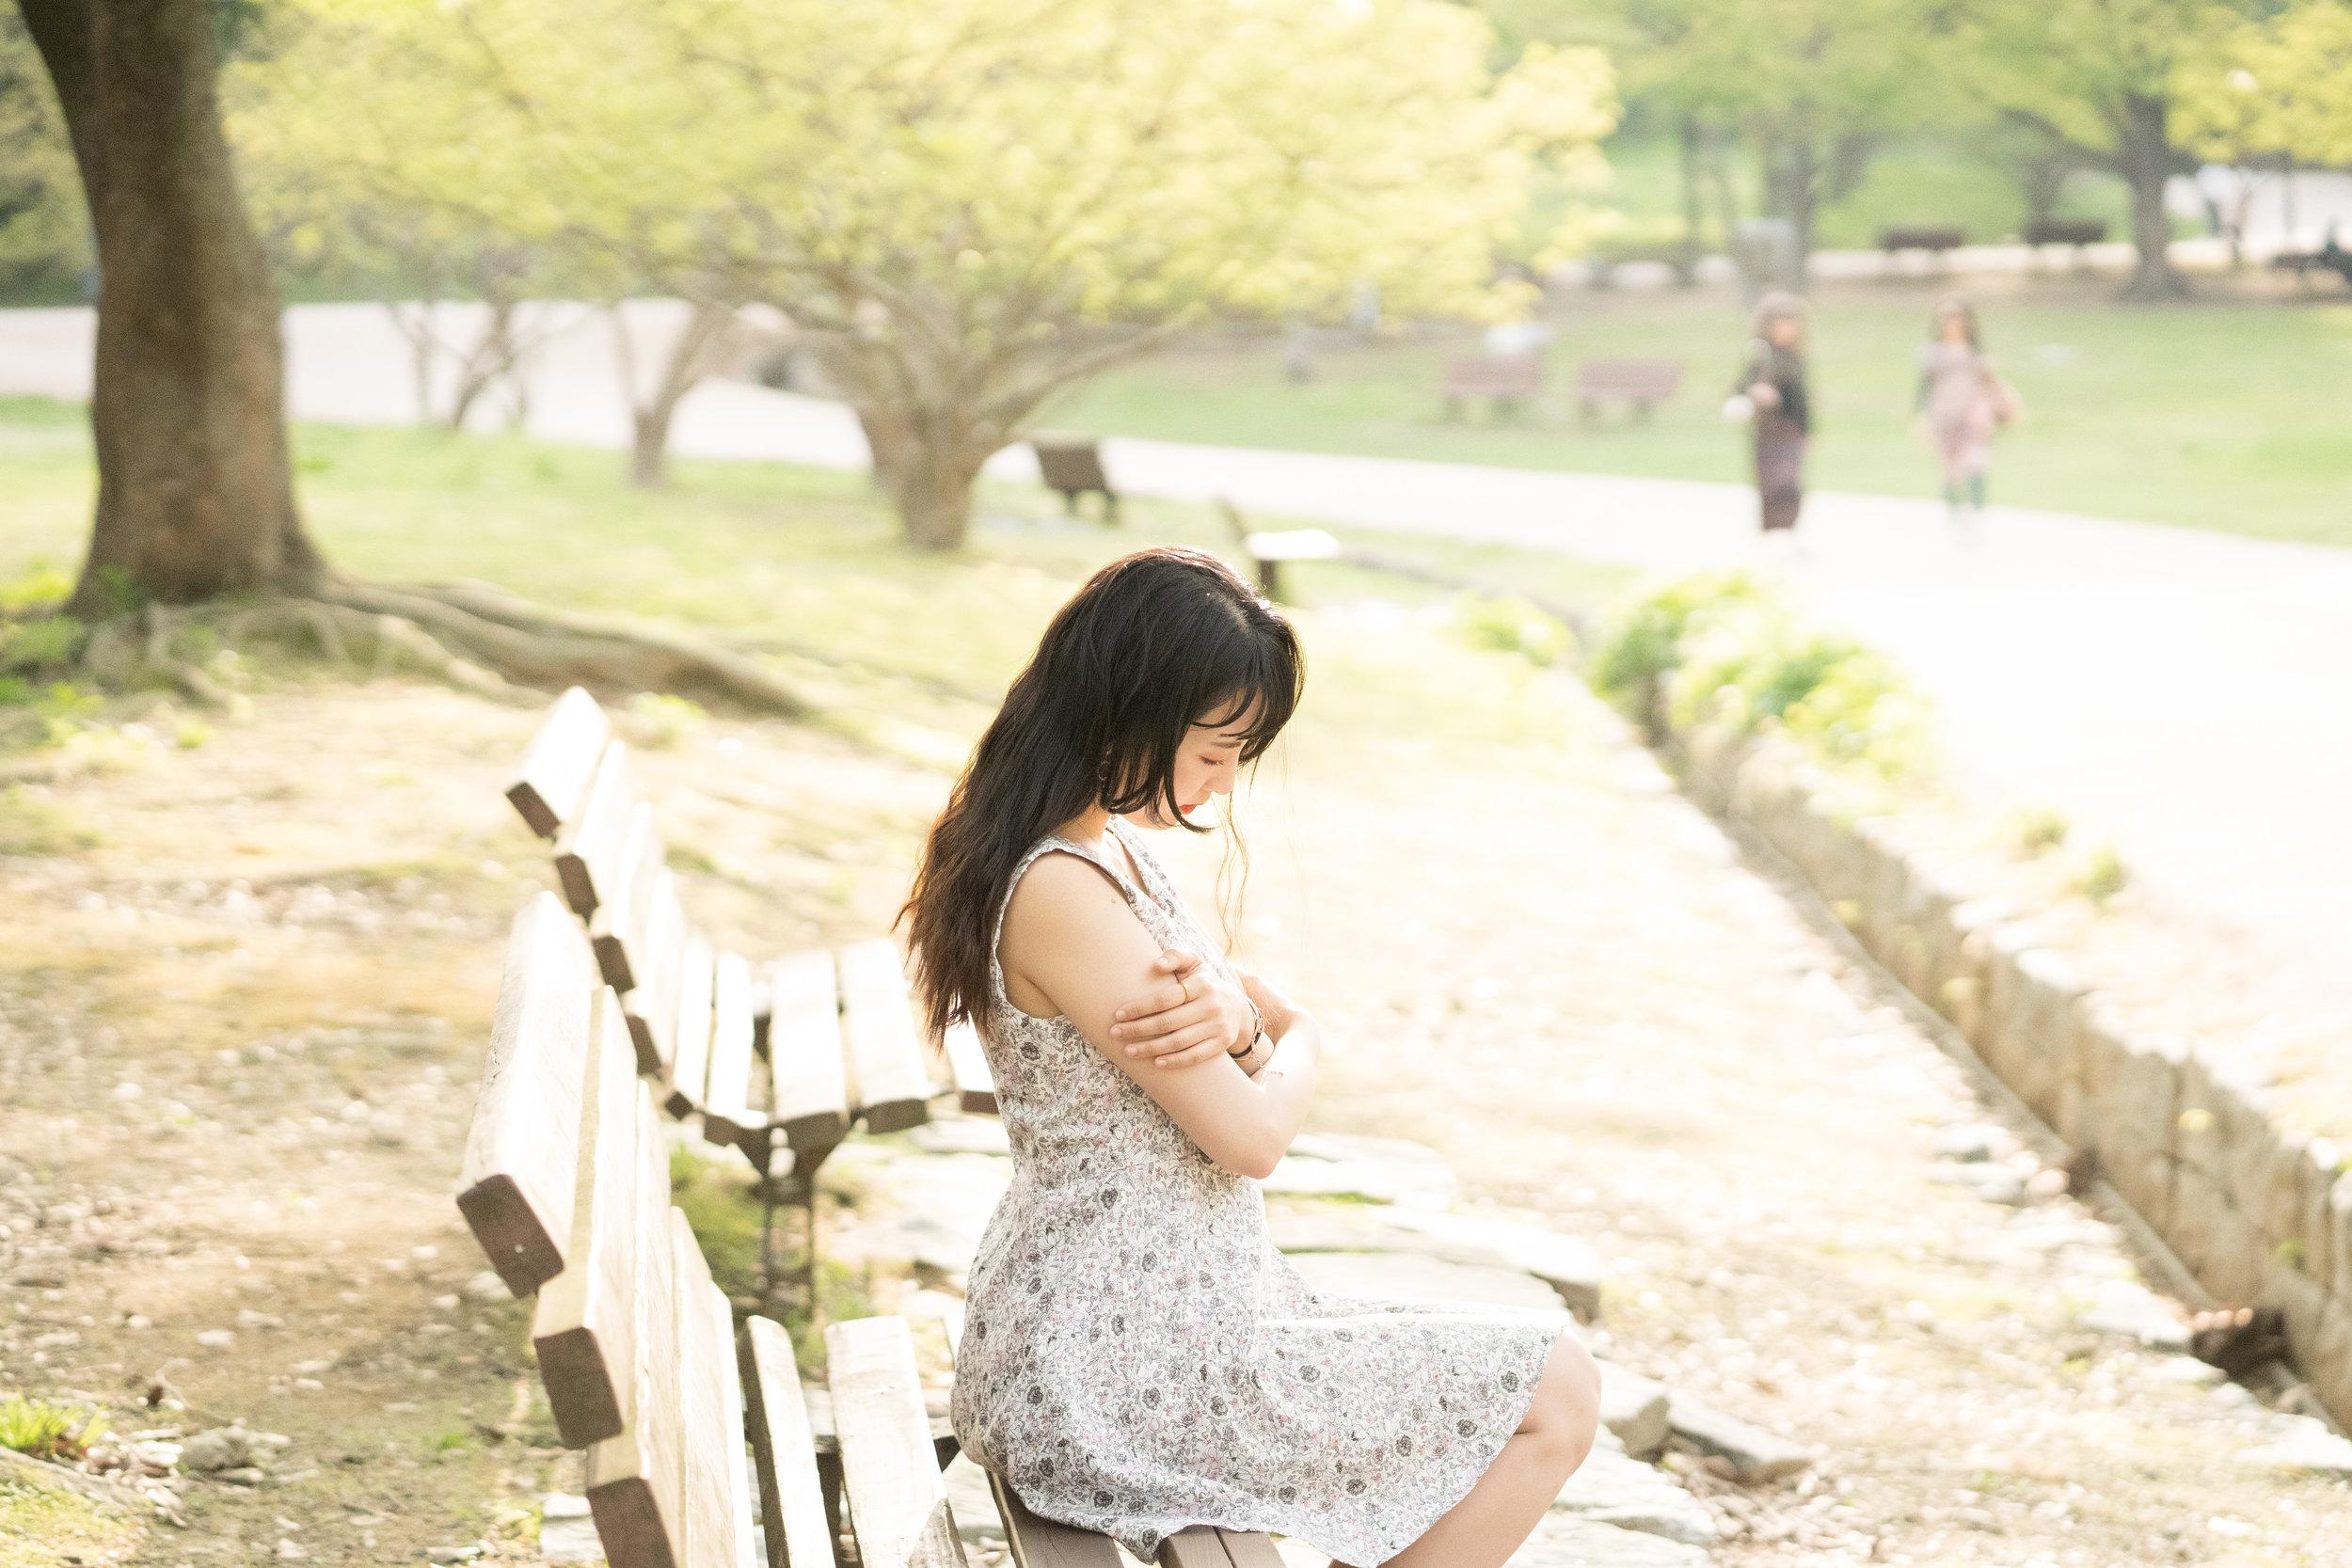 Sprazzi_Professional_Photography_Photographer_Seoul_Korea_Sion_Original_77.jpg